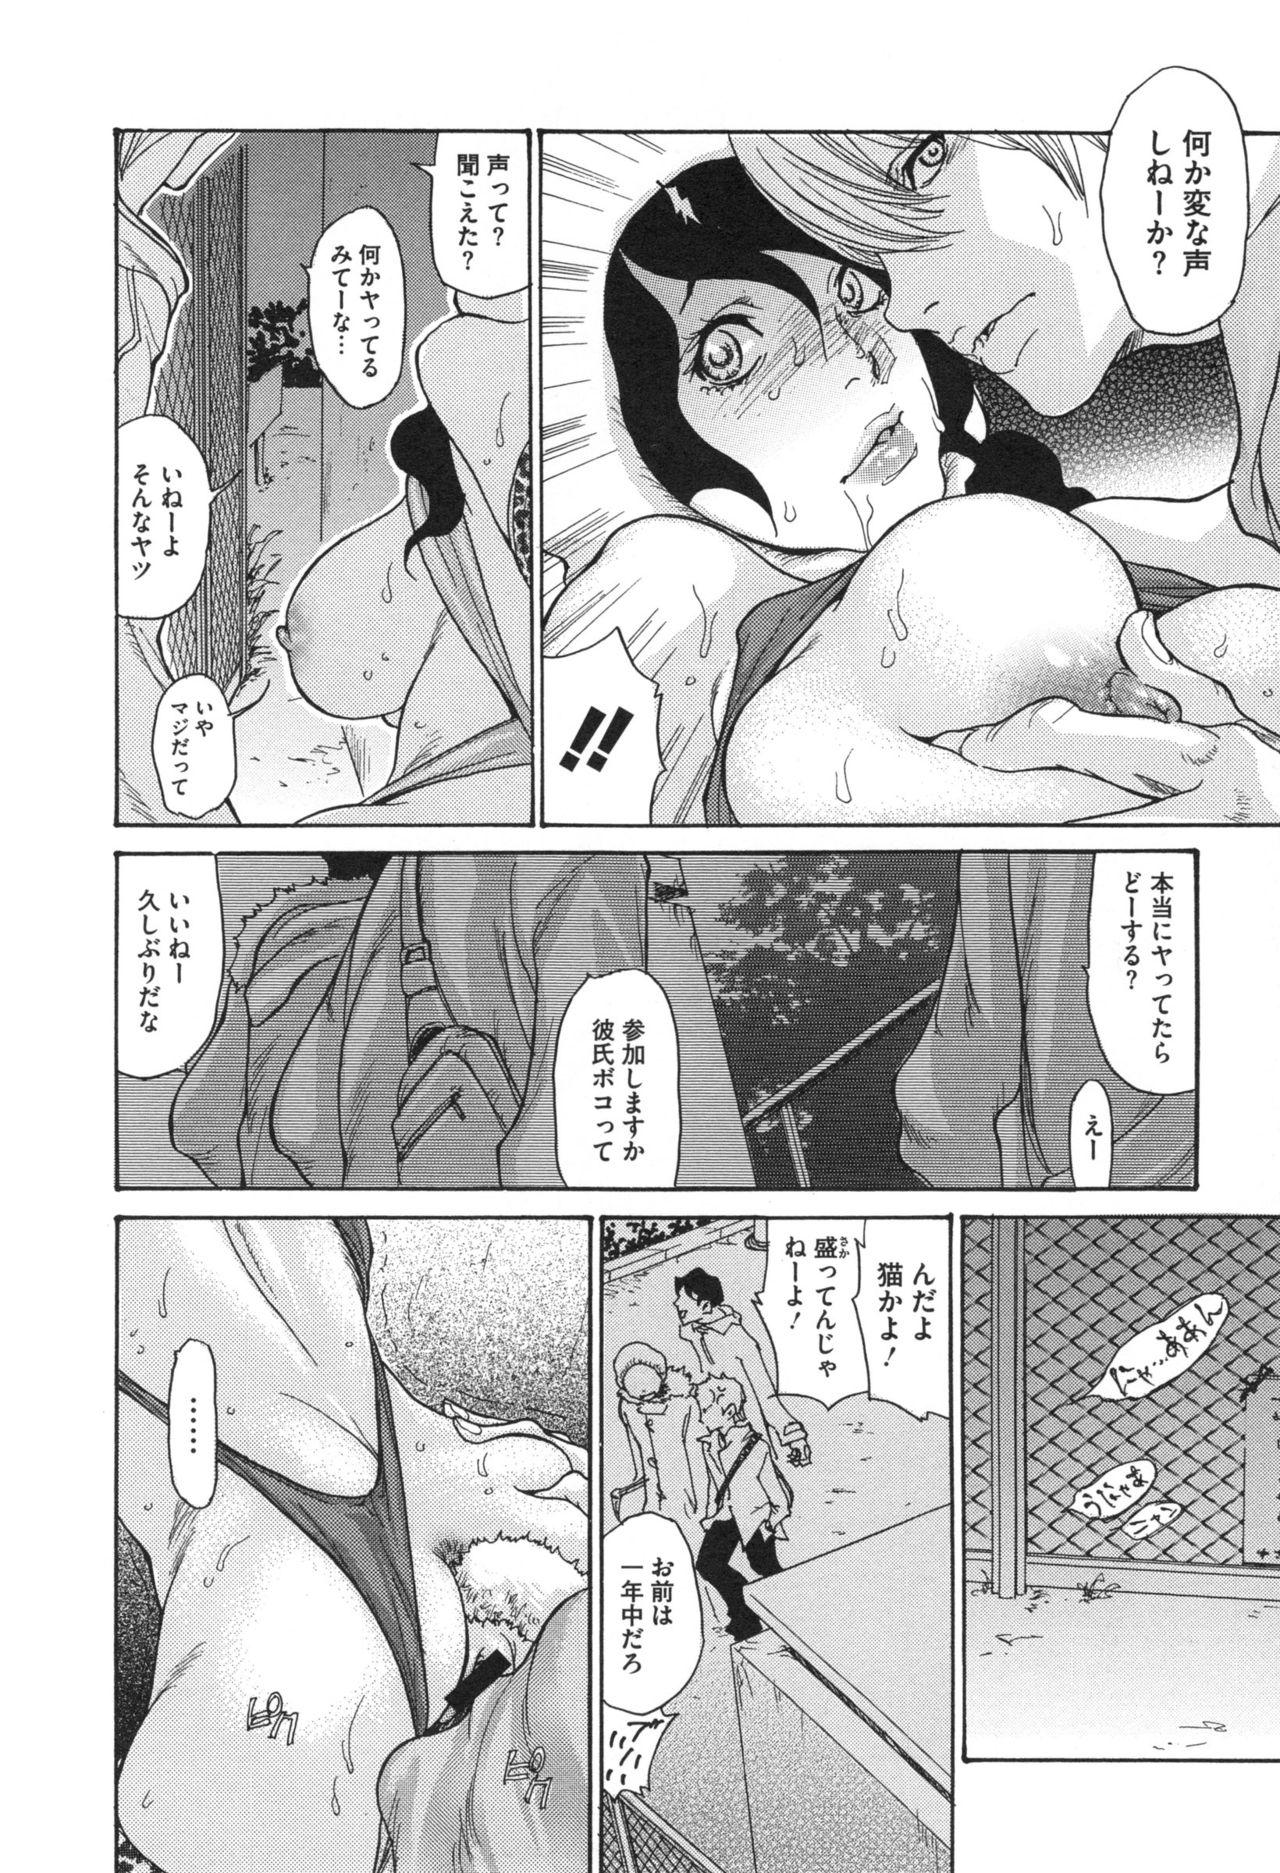 Niku-zuma Netorare Maniacs 188